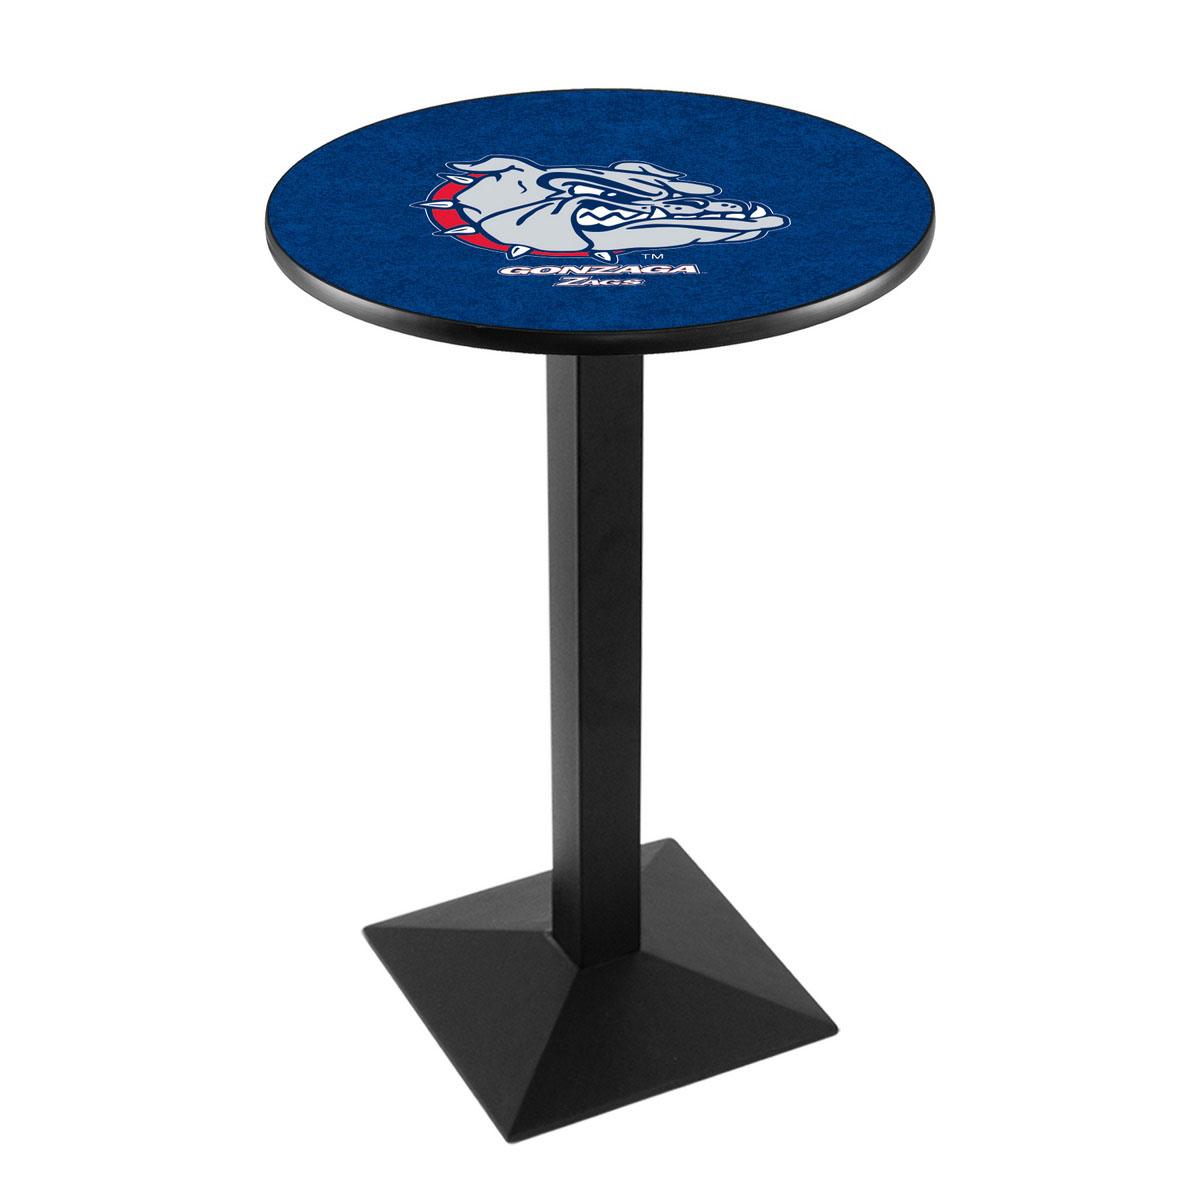 Trustworthy Gonzaga Logo Pub Bar Table Square Stand Product Photo